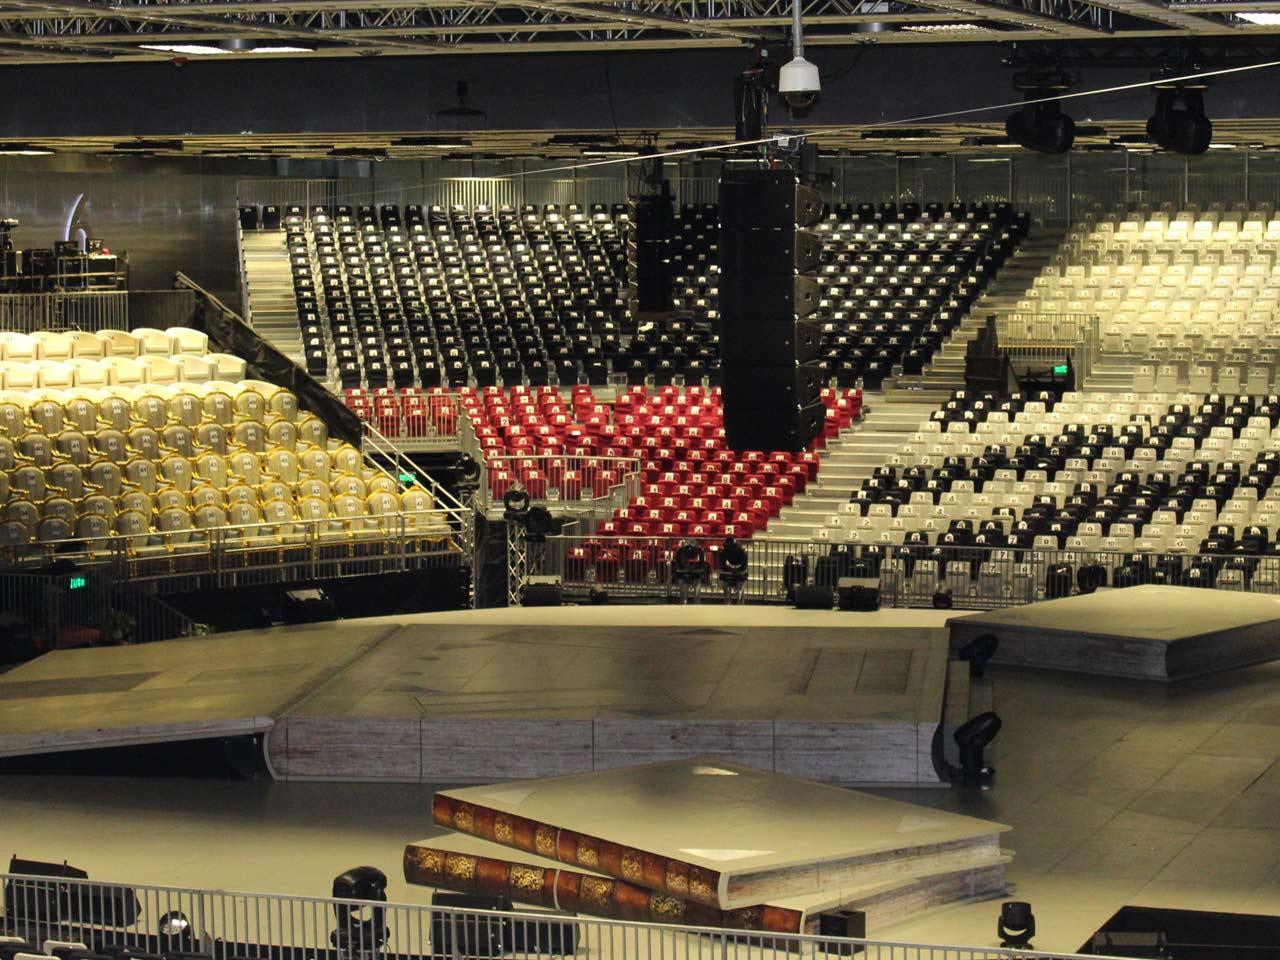 grandstand-seats-events-setup-rental-stadium-seating-sport-management-film-festival-seating-screening-f1-open-air-cinema-15